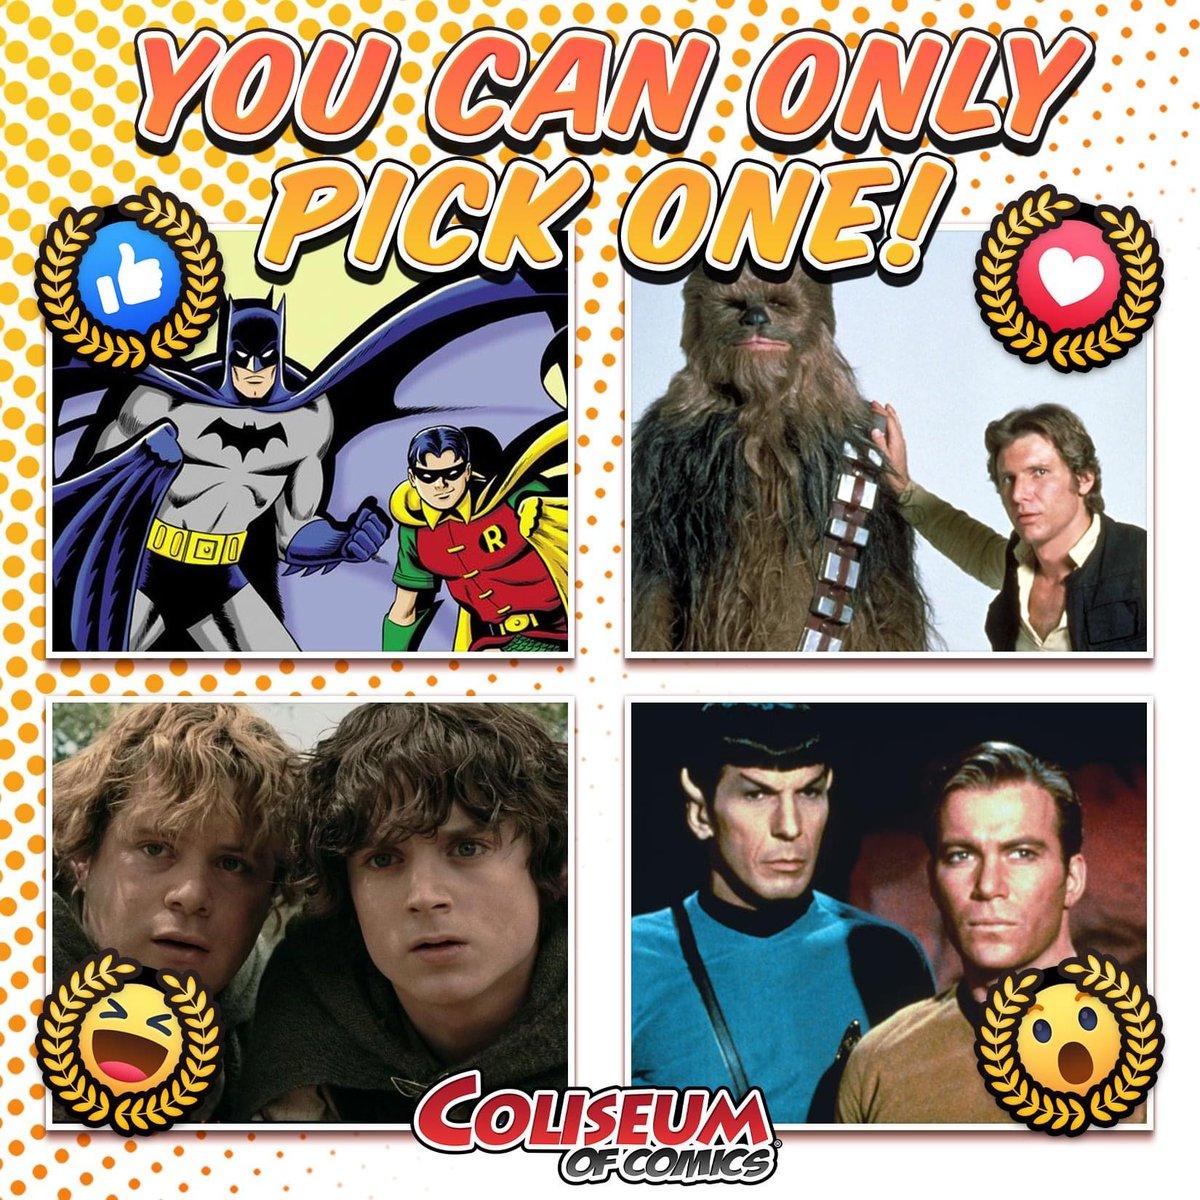 Which dynamic duo would win a three-legged race? #ColiseumOfComics #DCComics #StarWars #LotR #StarTrek https://t.co/5qfhwMpVzJ